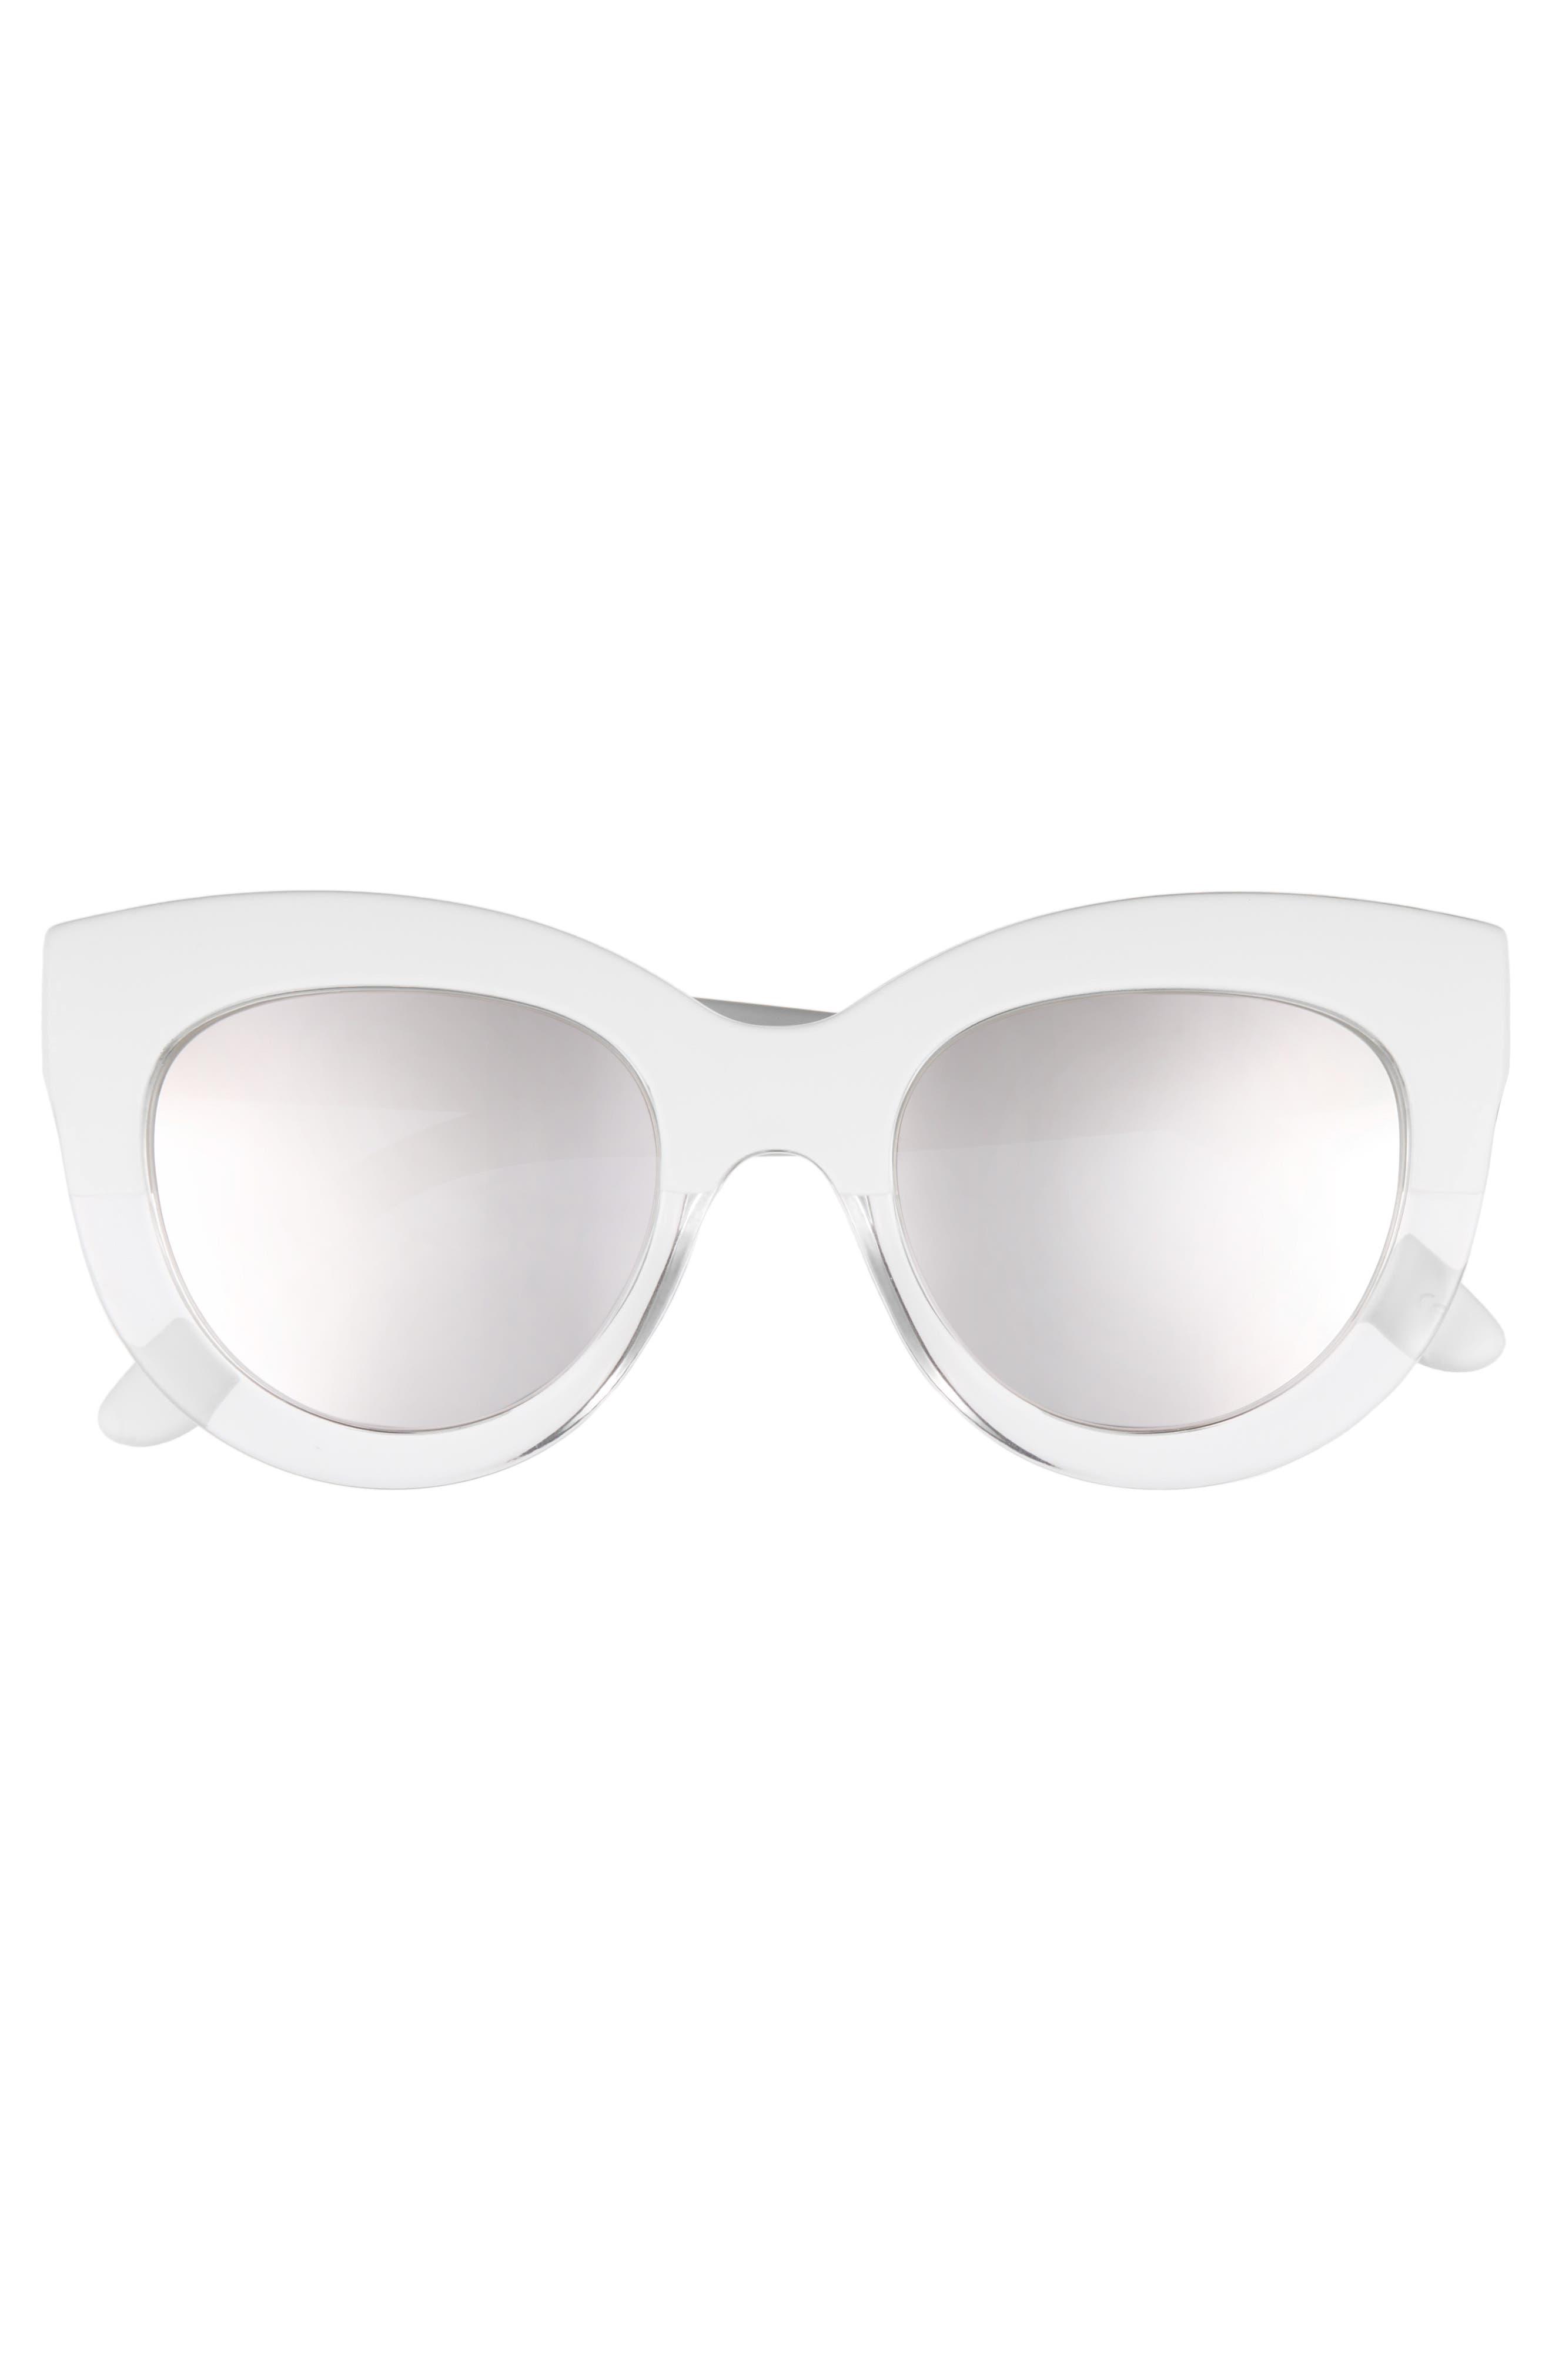 Tortola V2 51mm Polarized Cat Eye Sunglasses,                             Alternate thumbnail 3, color,                             White Splice